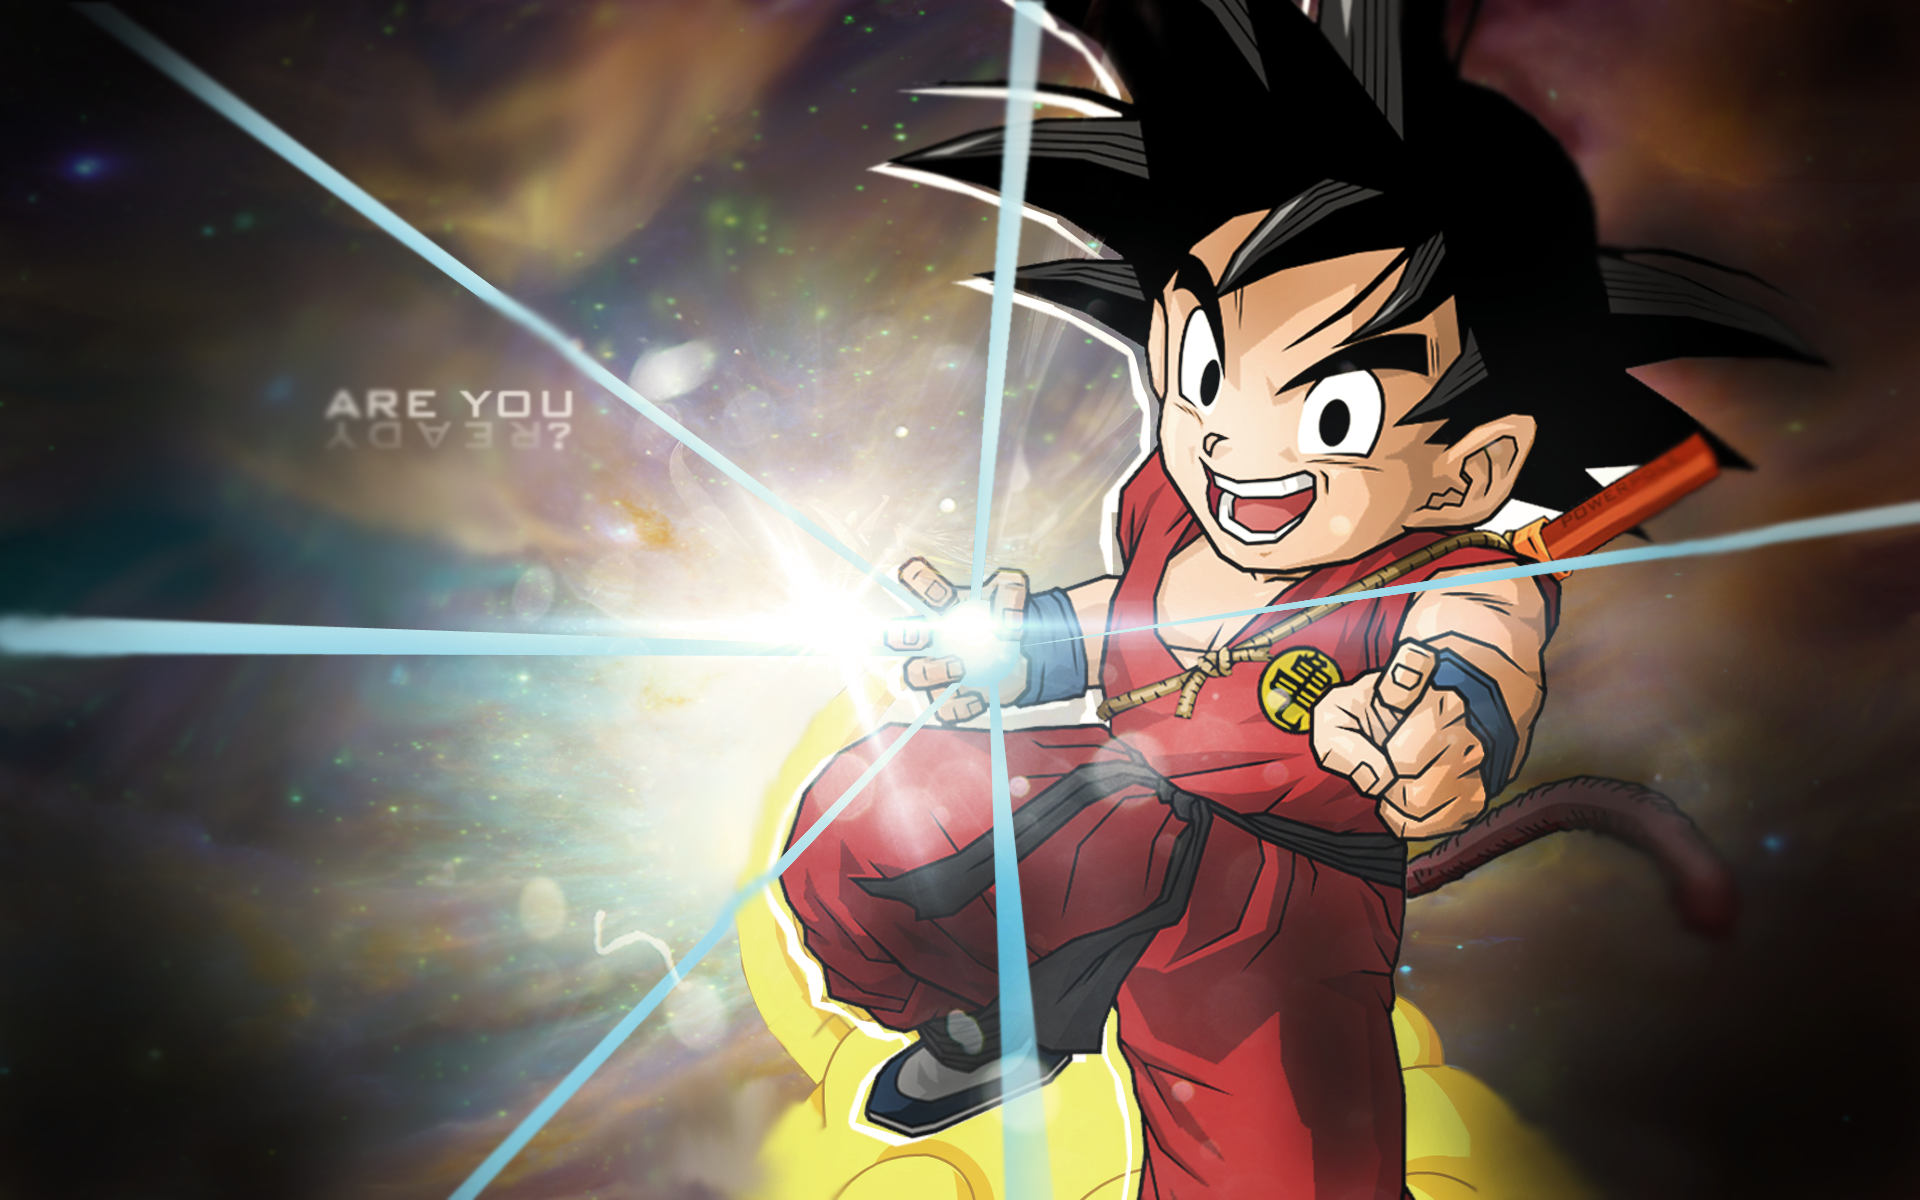 Kid Goku Wallpaper By Kevenp On Deviantart